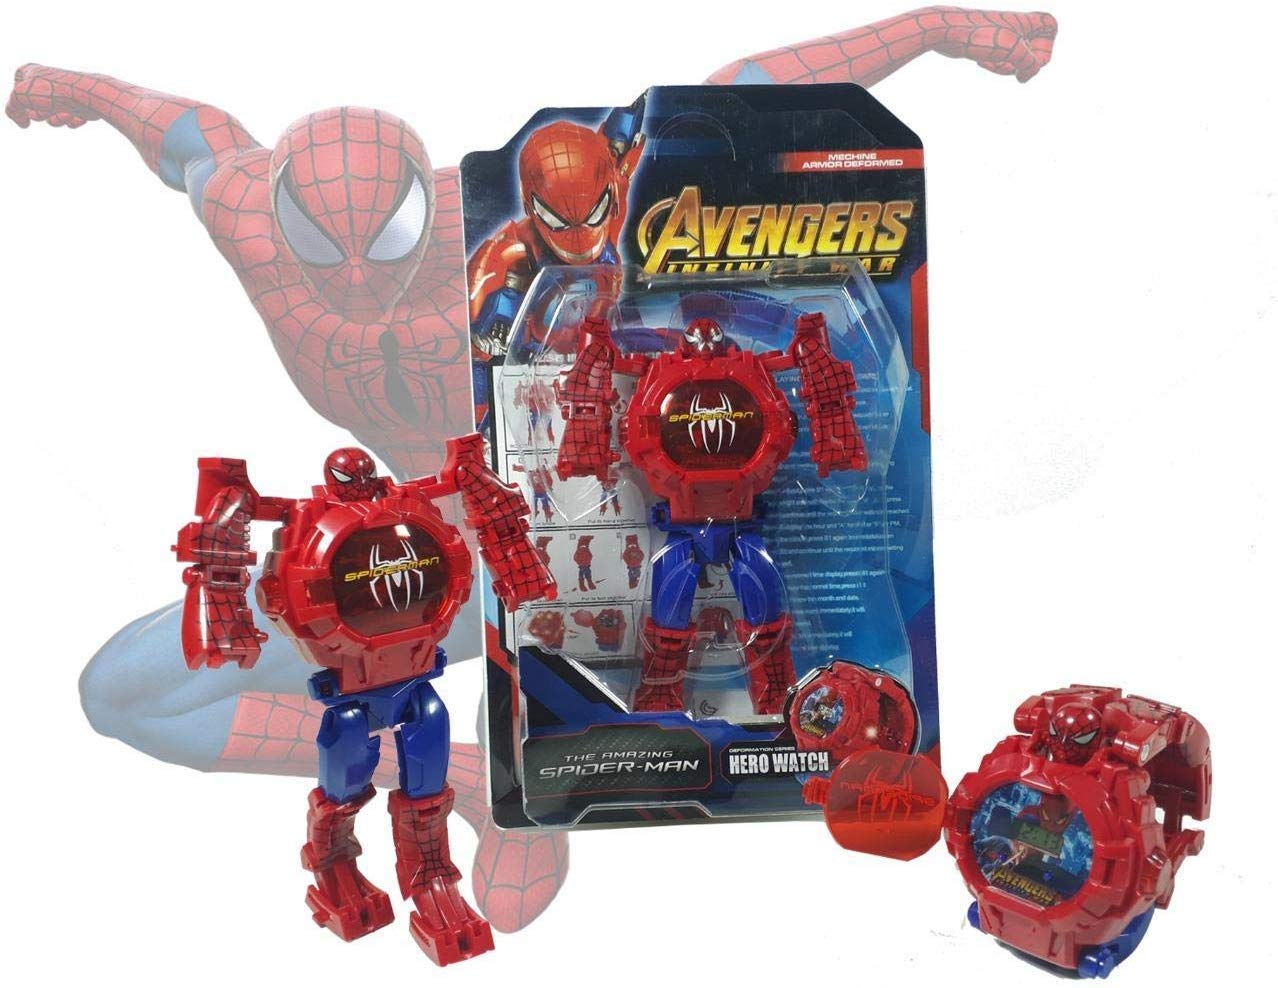 Transformers Action Figure Kids Toys Robot Spiderman Avengers Model Iron Man